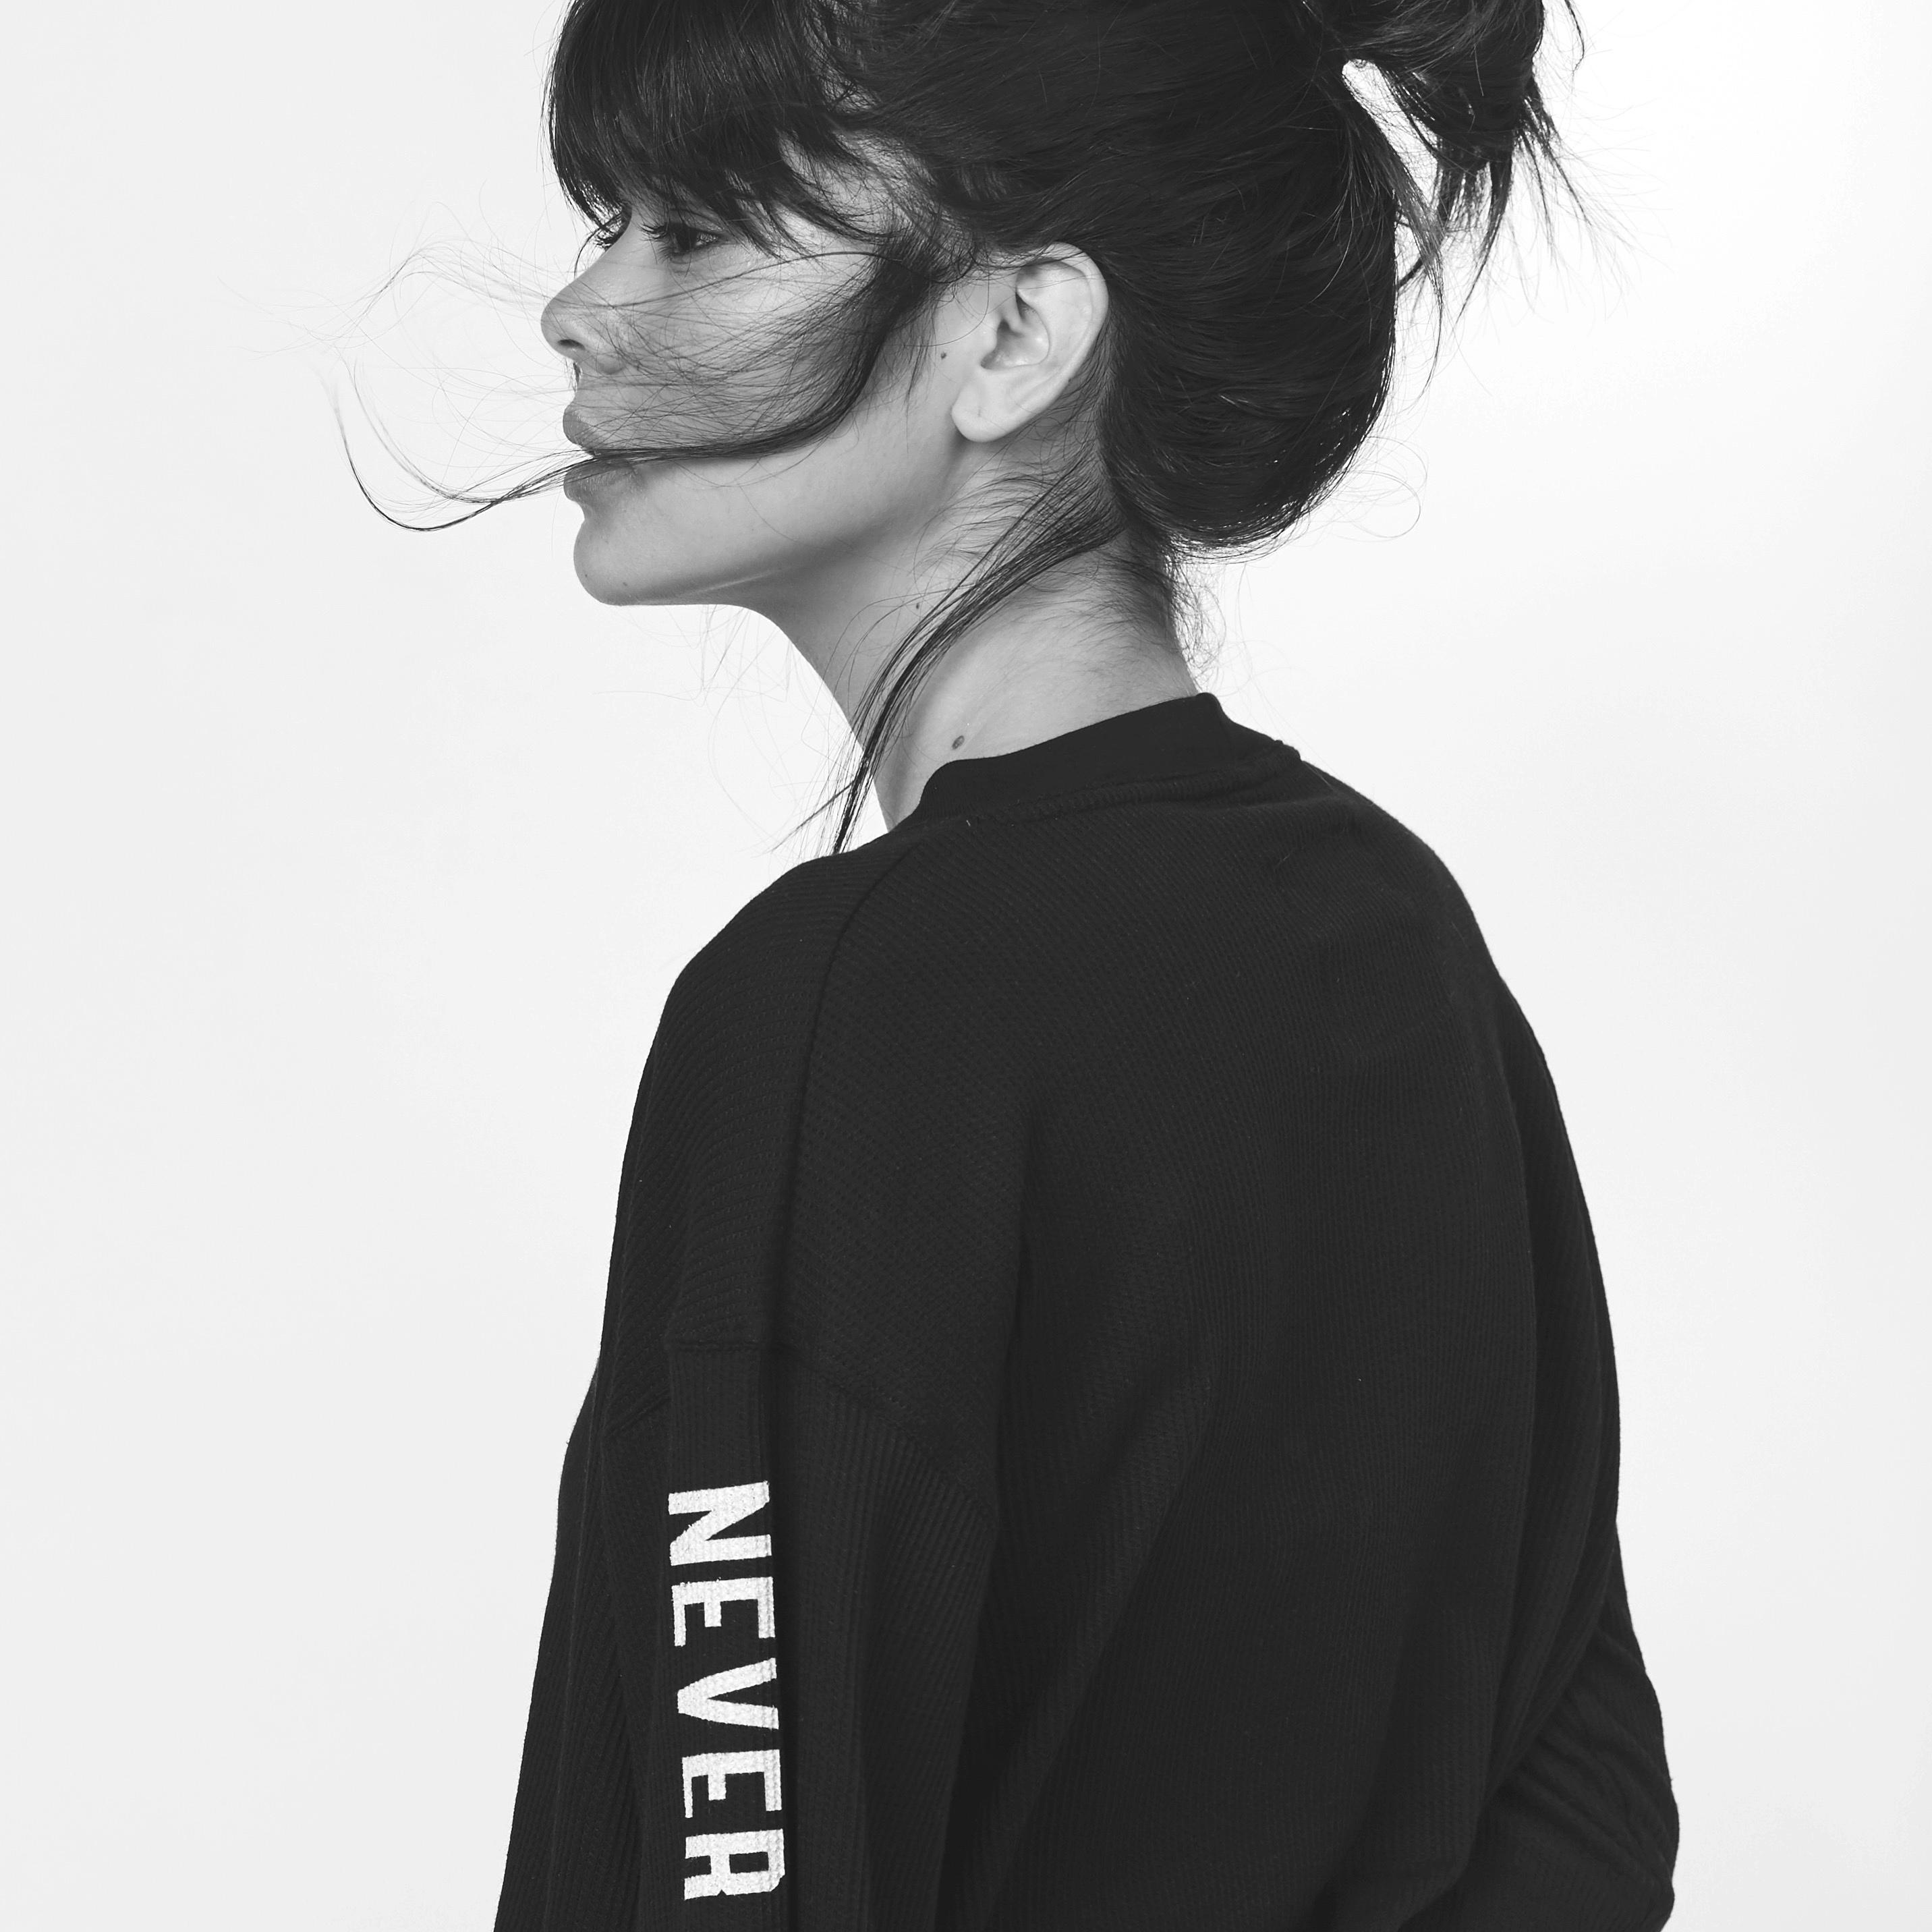 Sumi Yamaguchi / לירון ויסמן